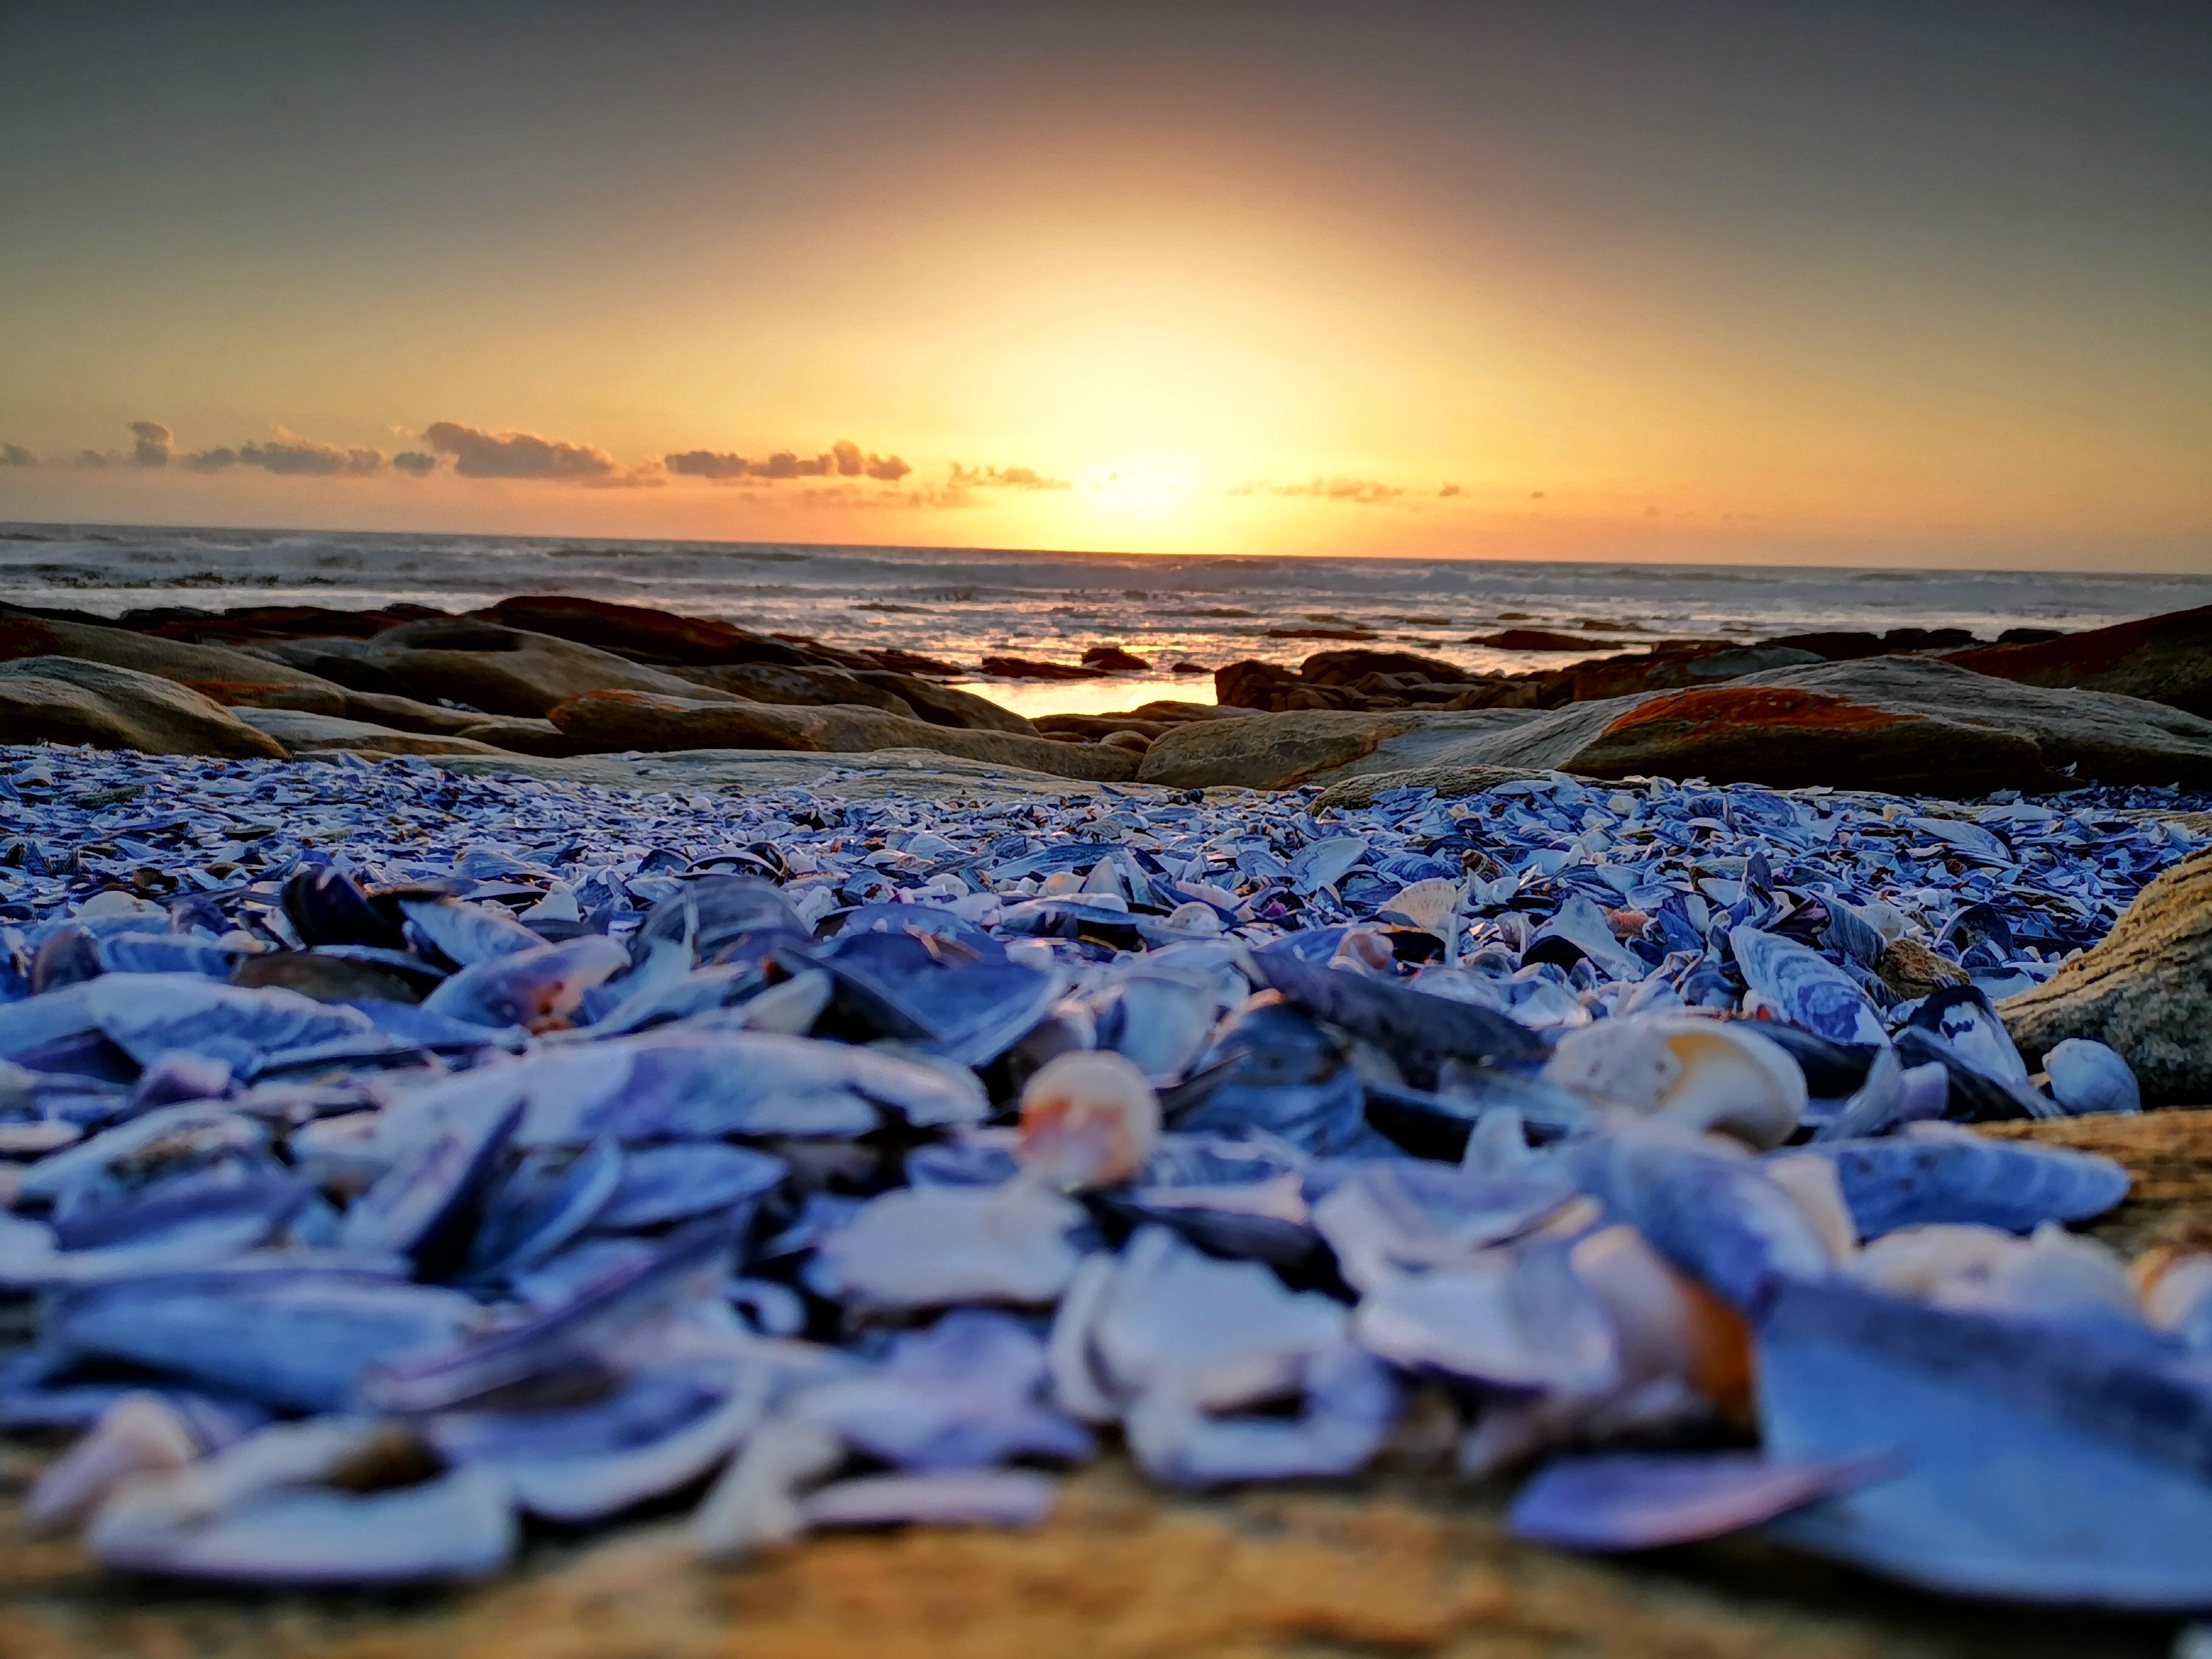 seashells sunset photo competition winner kruger park south africa